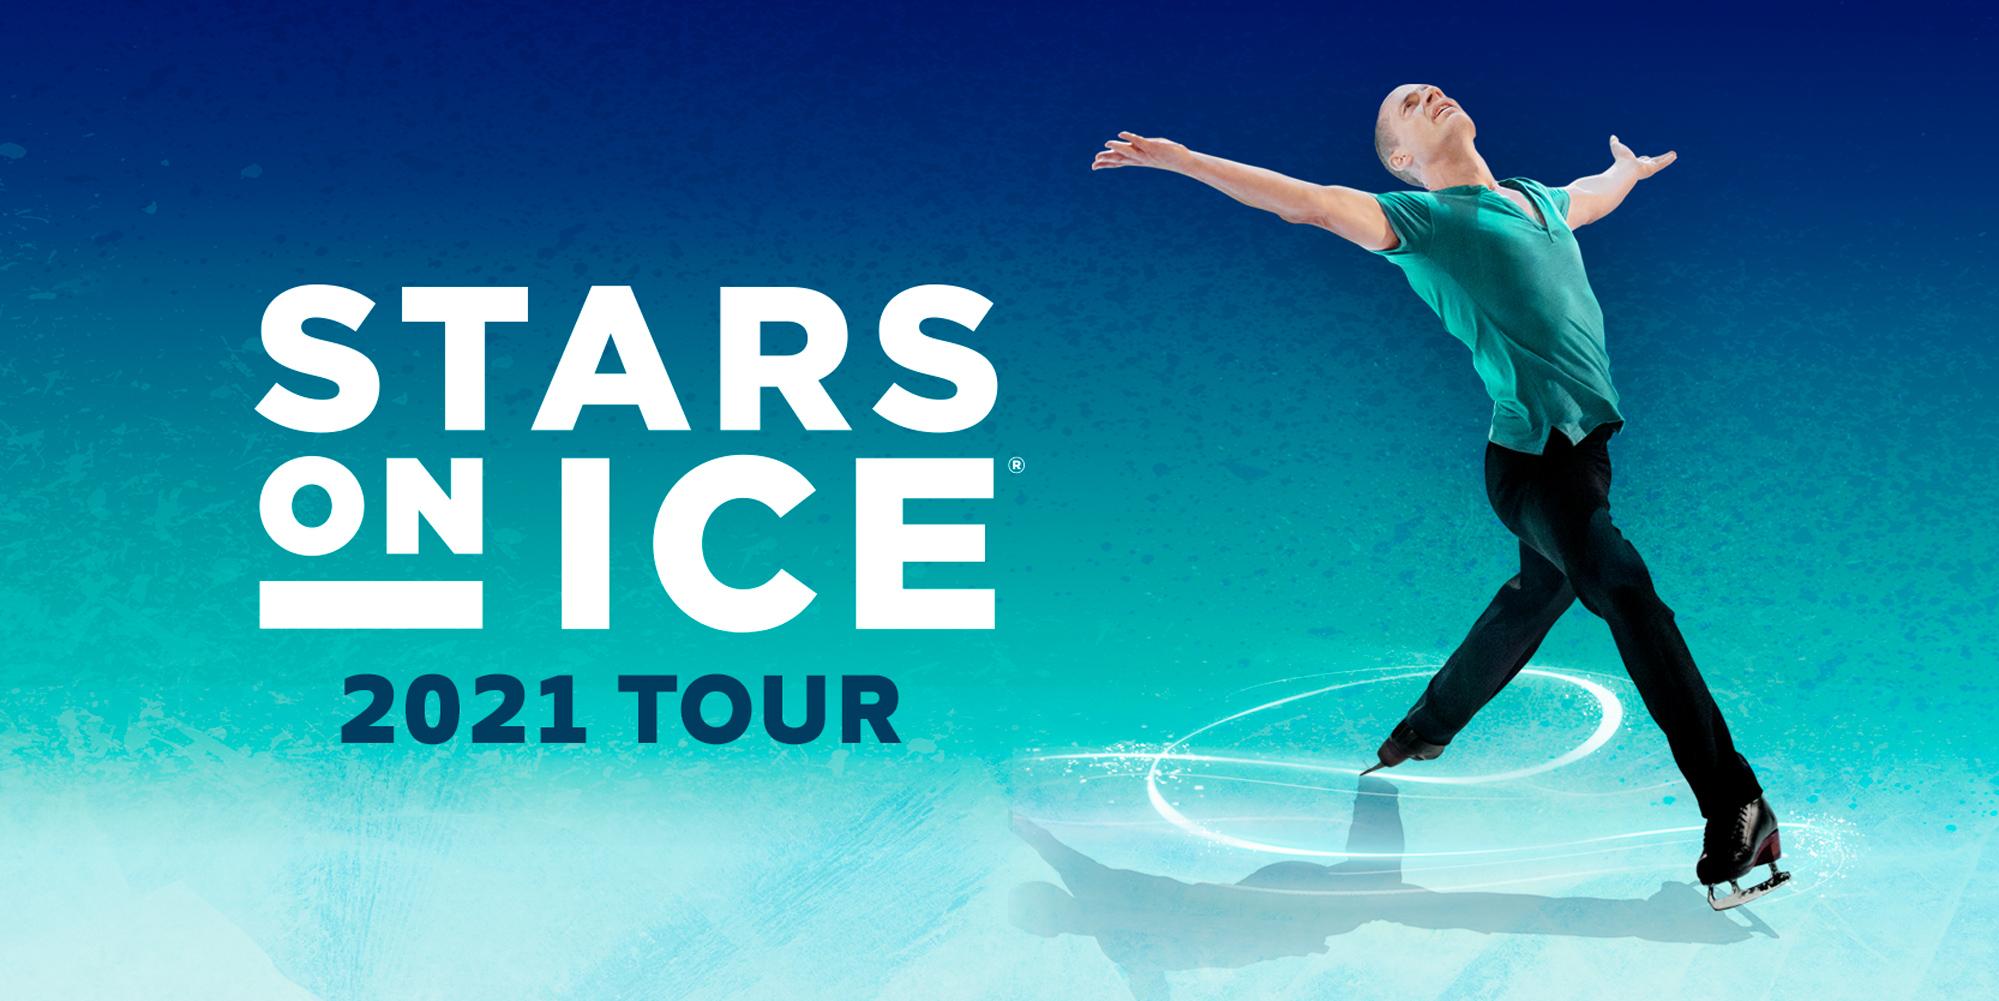 Stars on Ice 2021 Tour  600x300.jpg